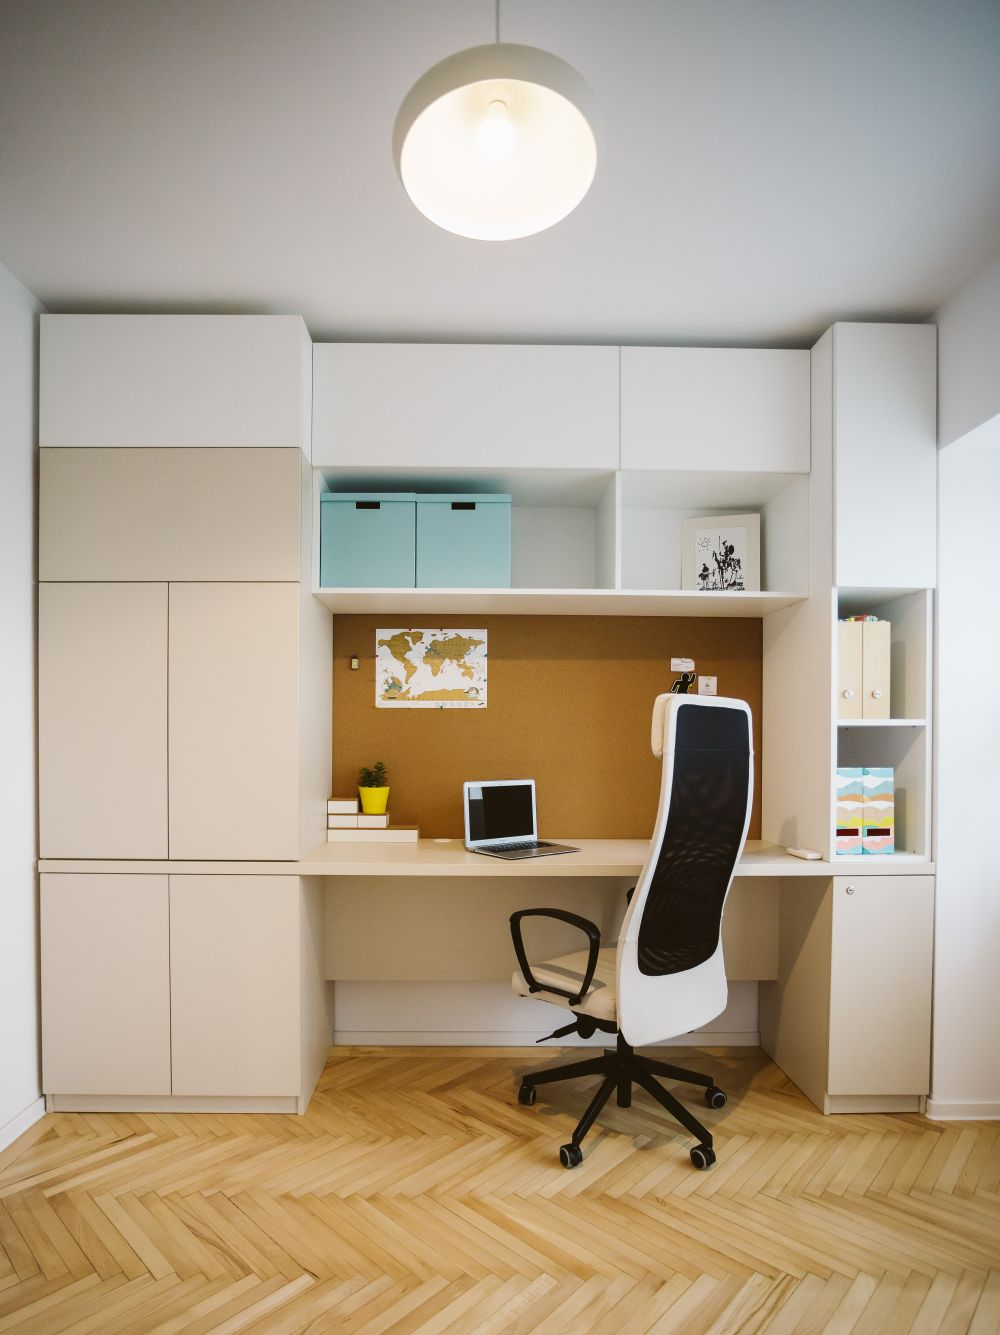 adelaparvu-com-despre-apartament-3-camere-bucuresti-reamenajat-designer-mihaela-cetanas-foto-cezar-buliga-49